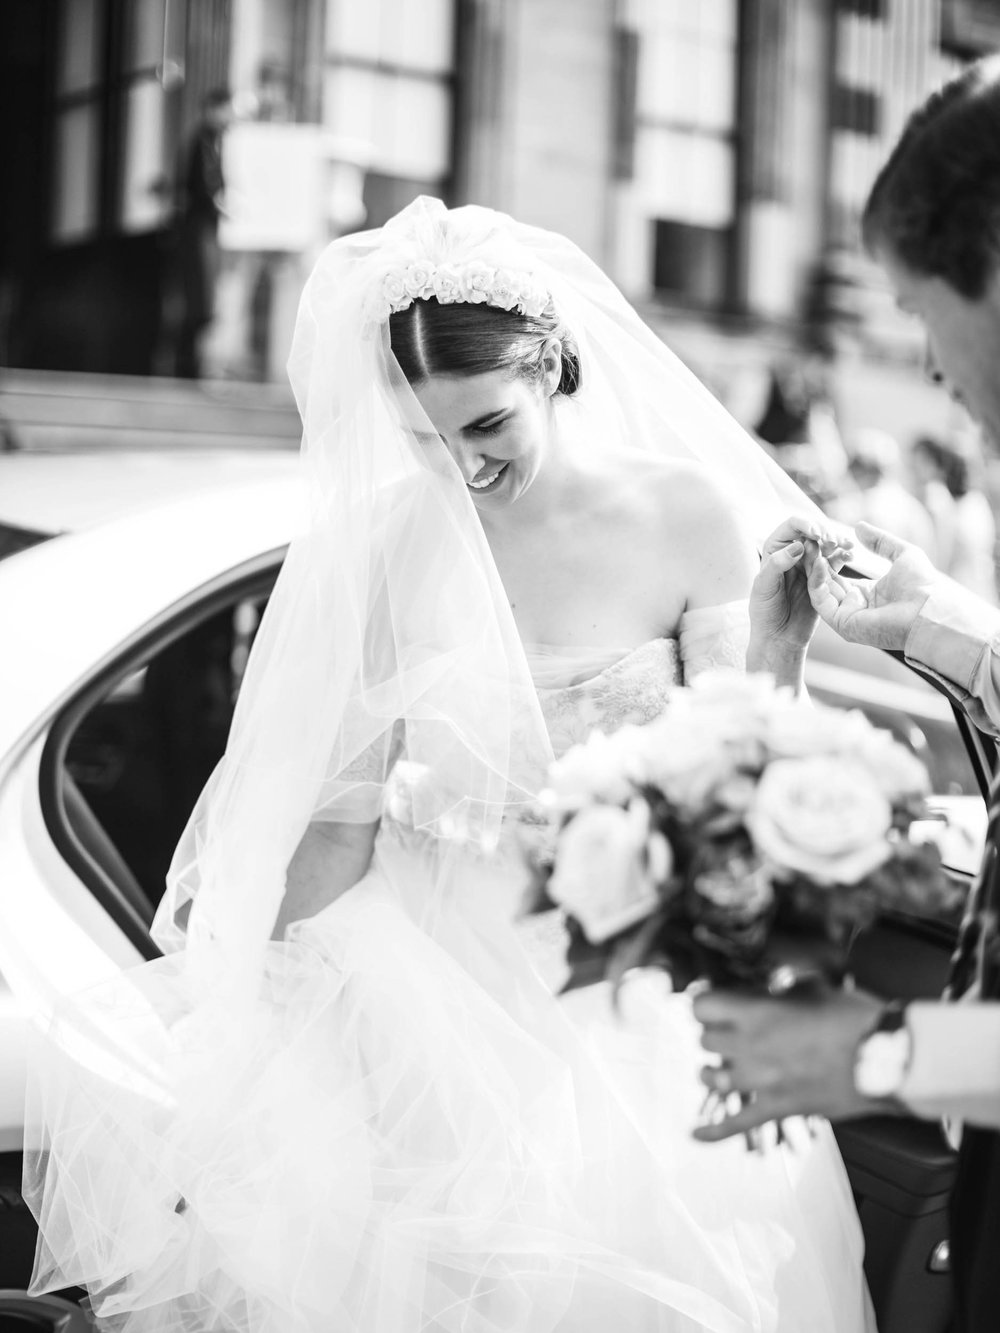 Amy O'Boyle Photography- Destination & UK Fine Art Film Wedding Photographer- Stoneleigh Abbey Wedding-32.jpg